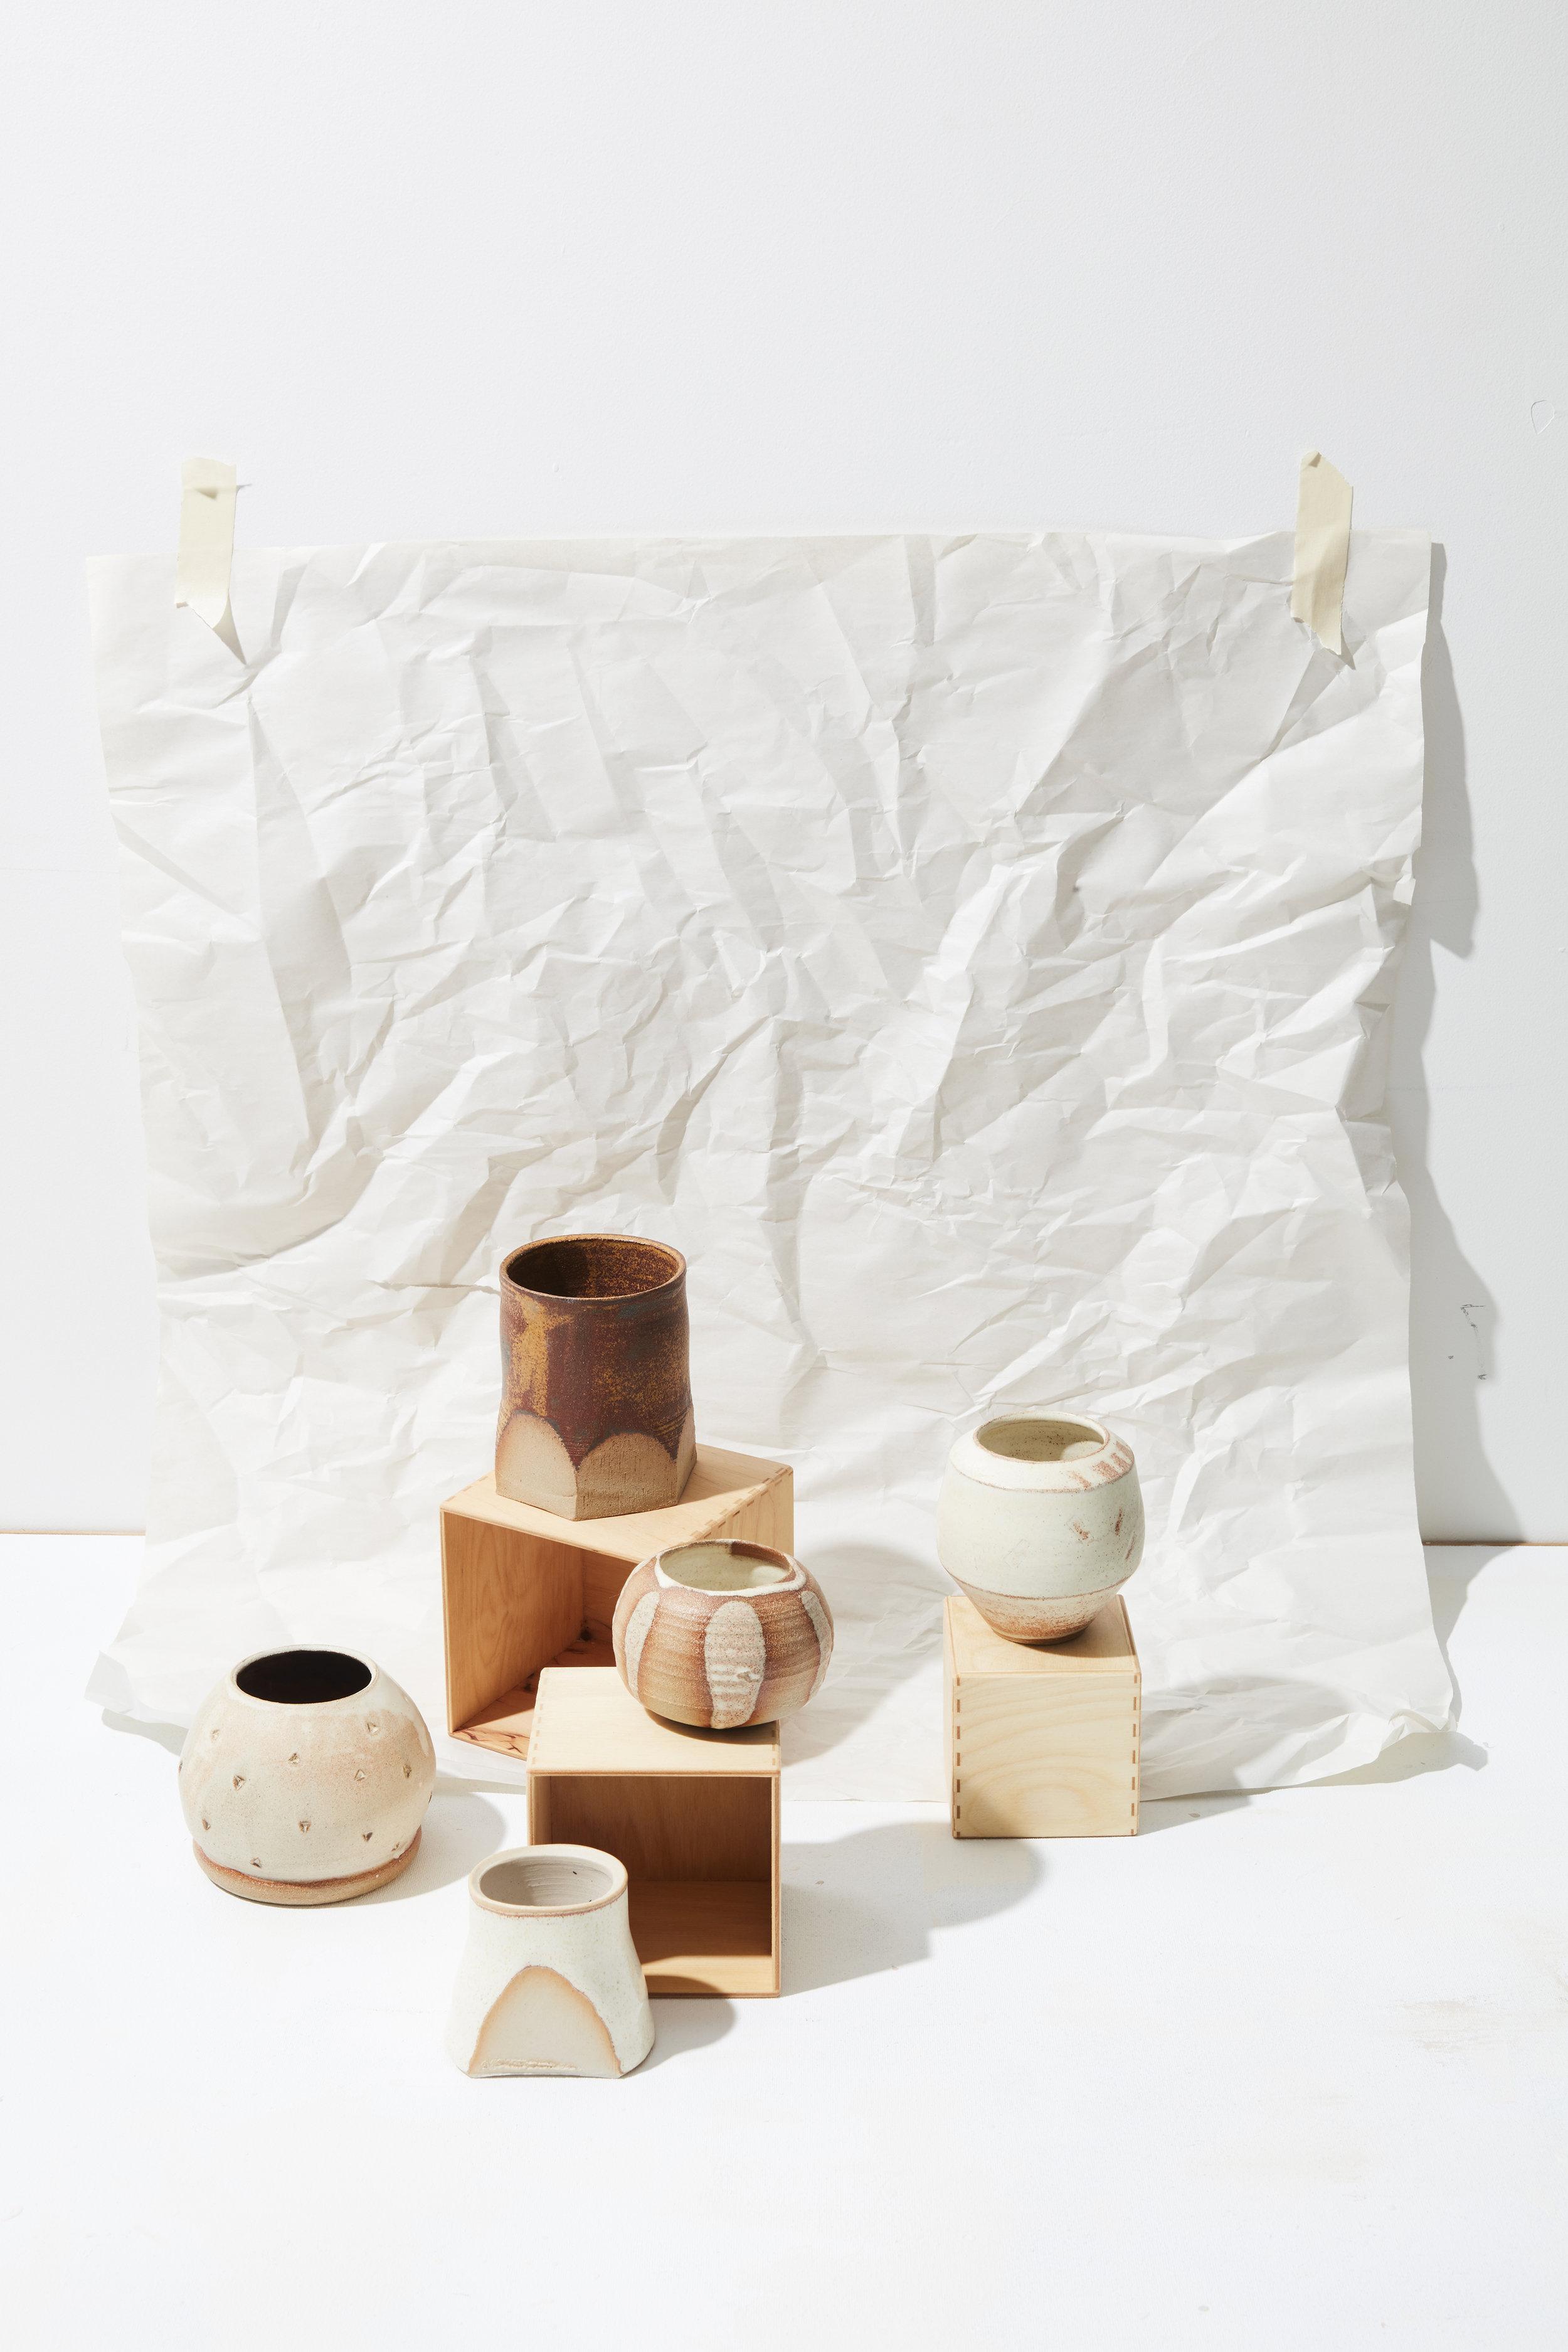 Pegboard_Pottery25628.JPG